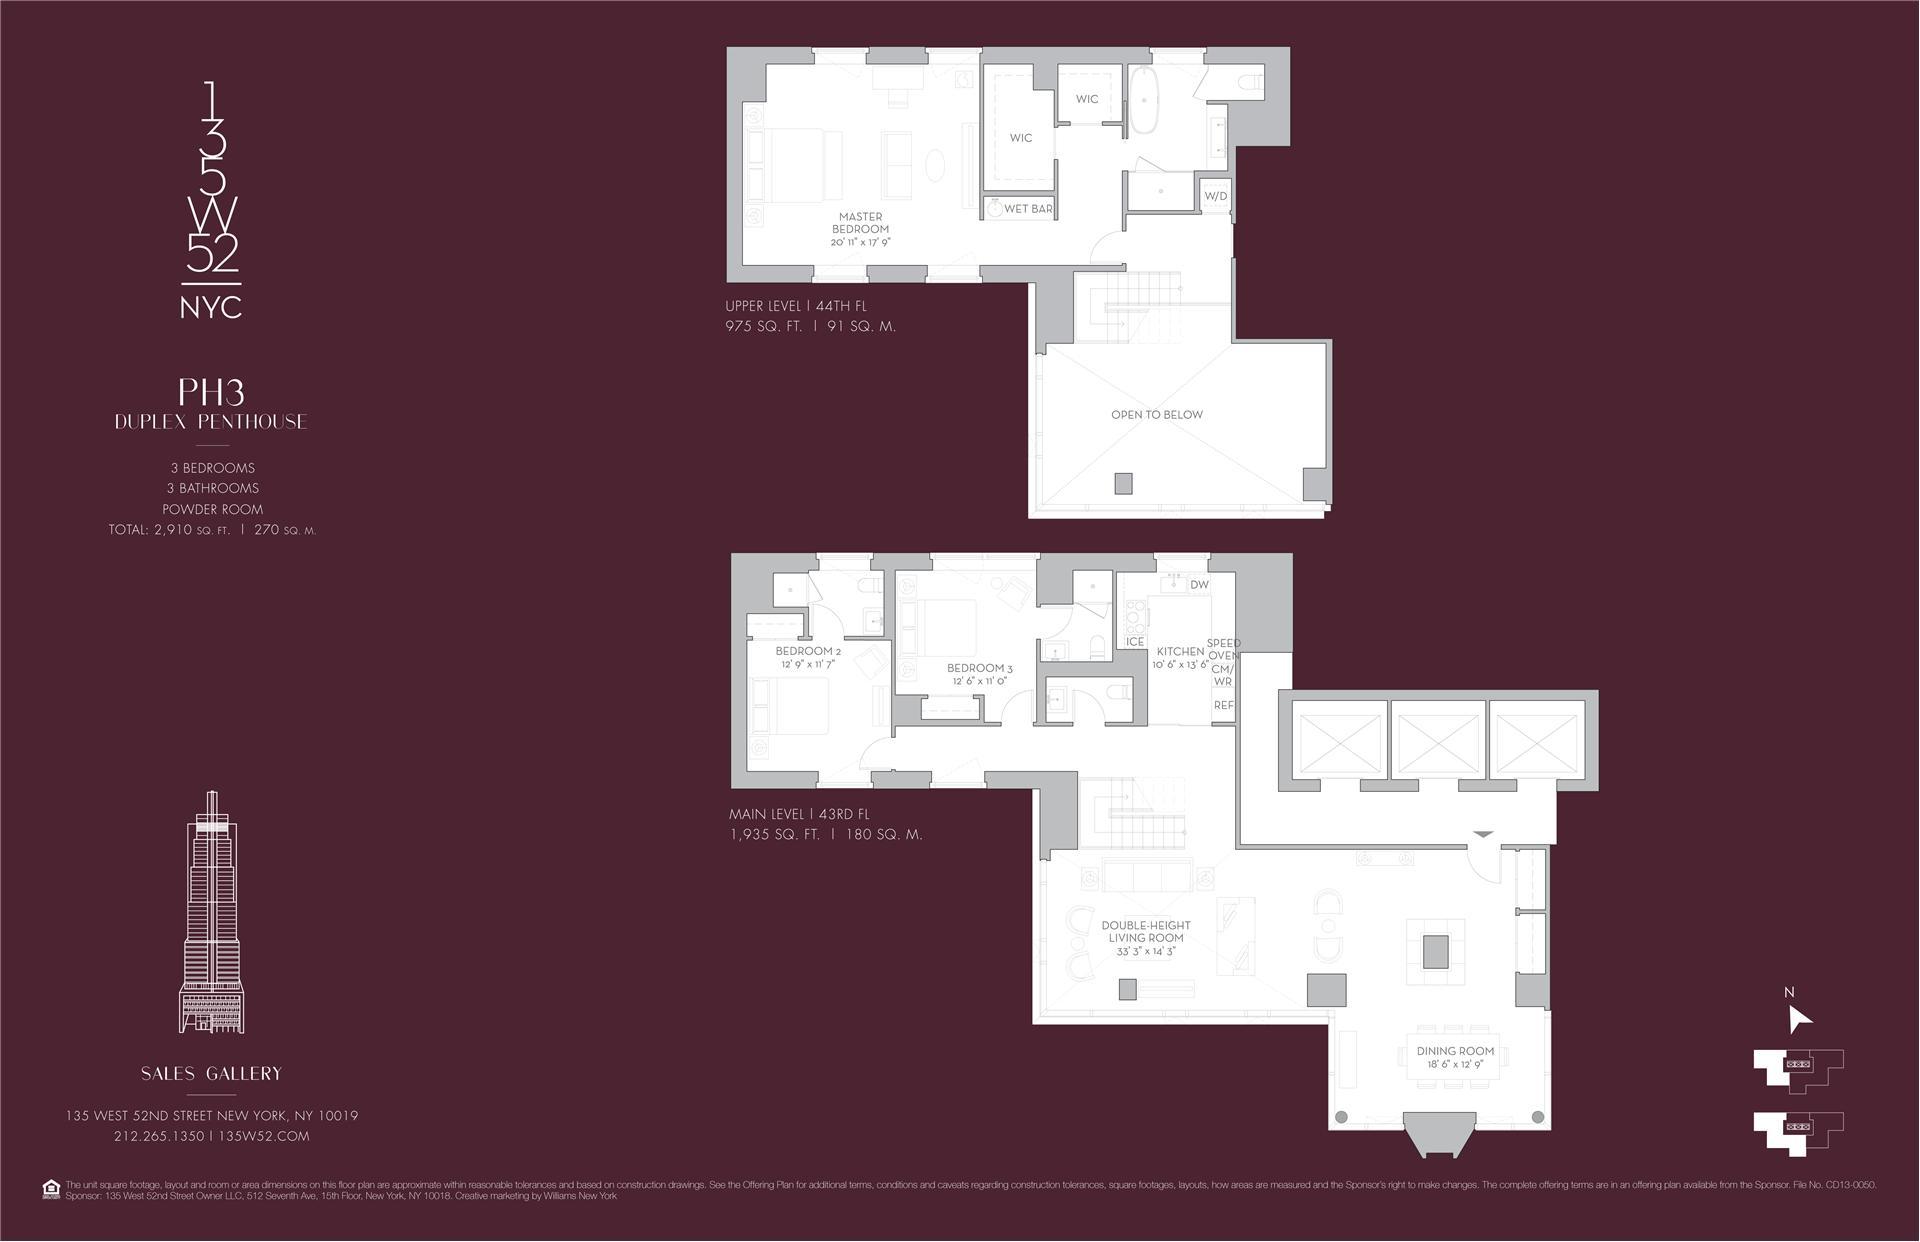 Floor plan of 135 West 52nd St, PH3 - Midtown, New York